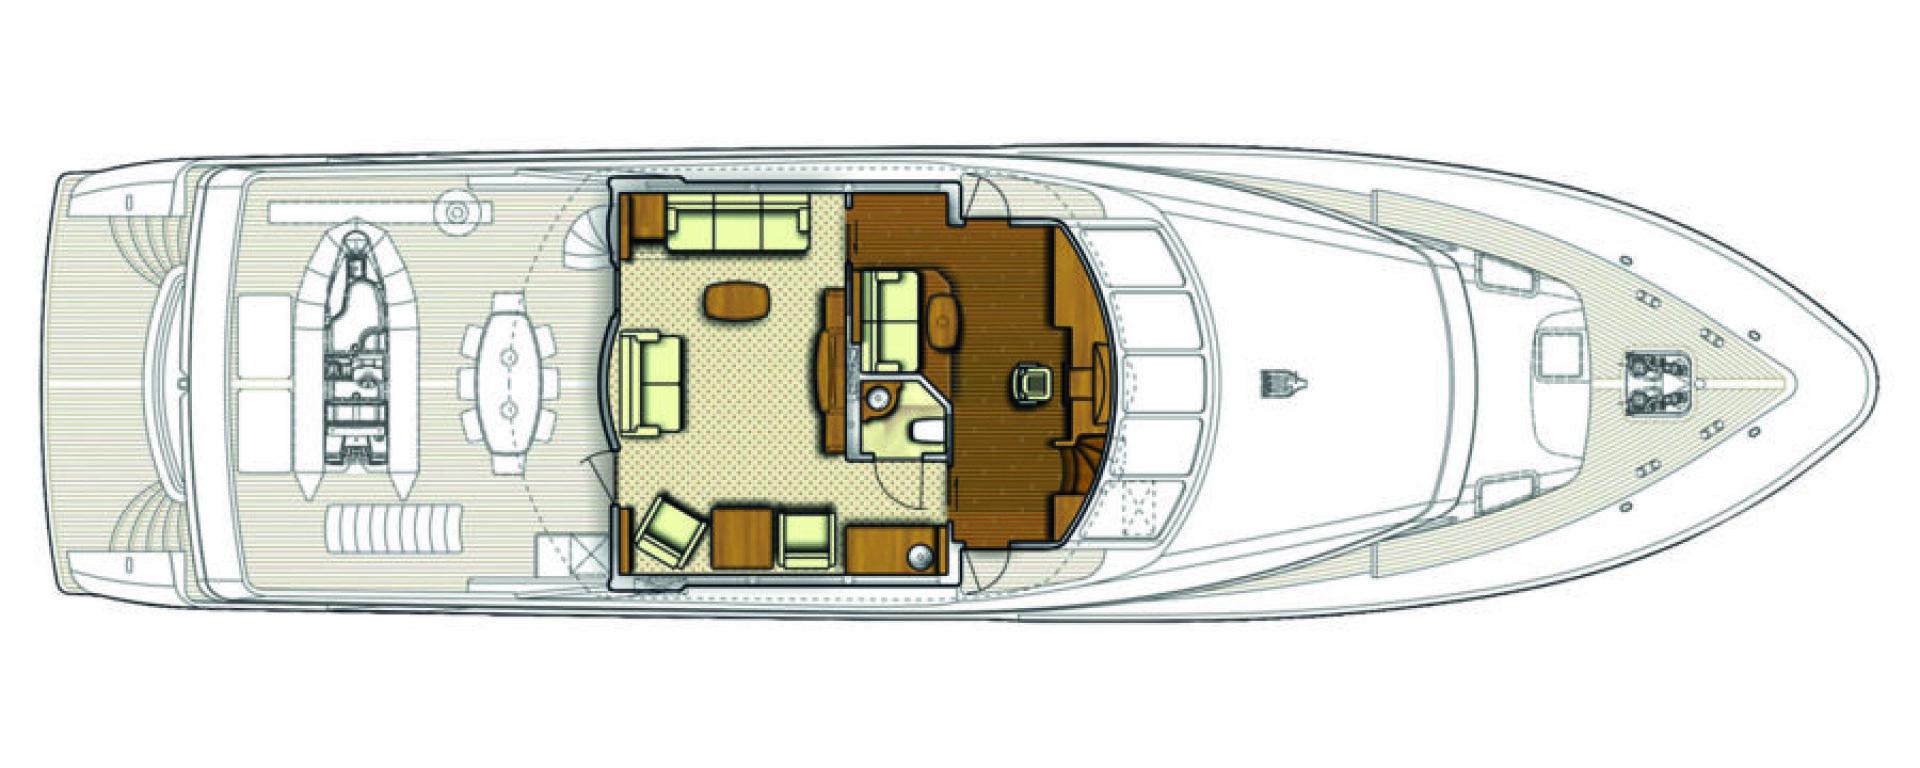 Conrad Shipyard-88 Motor Yacht 2005-Chillin Fort Lauderdale-Florida-United States-Conrad Motor Yacht 2005 Chillin-1537348 | Thumbnail